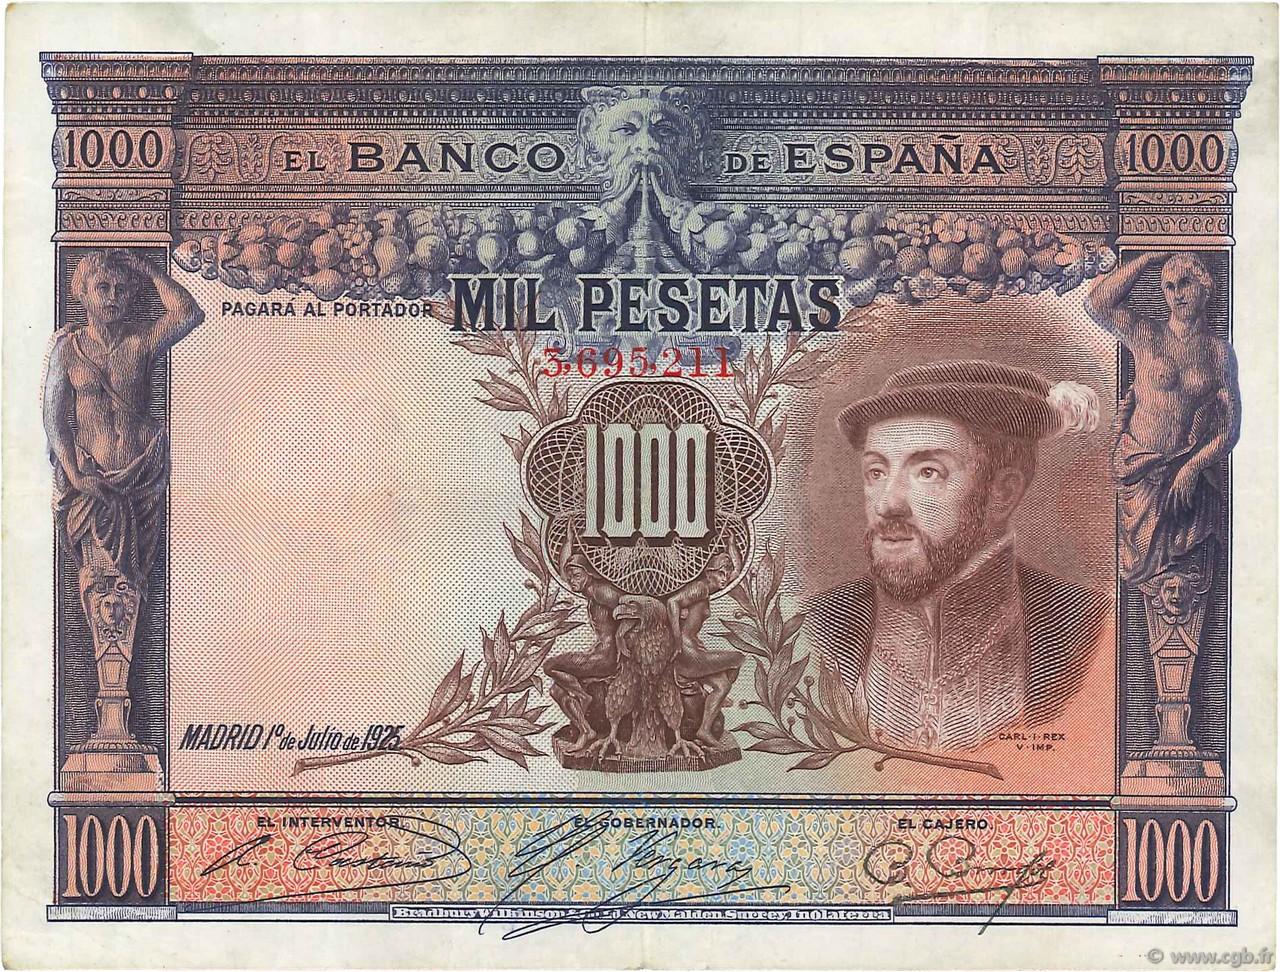 Fotos de billetes de 10000 pesetas 21